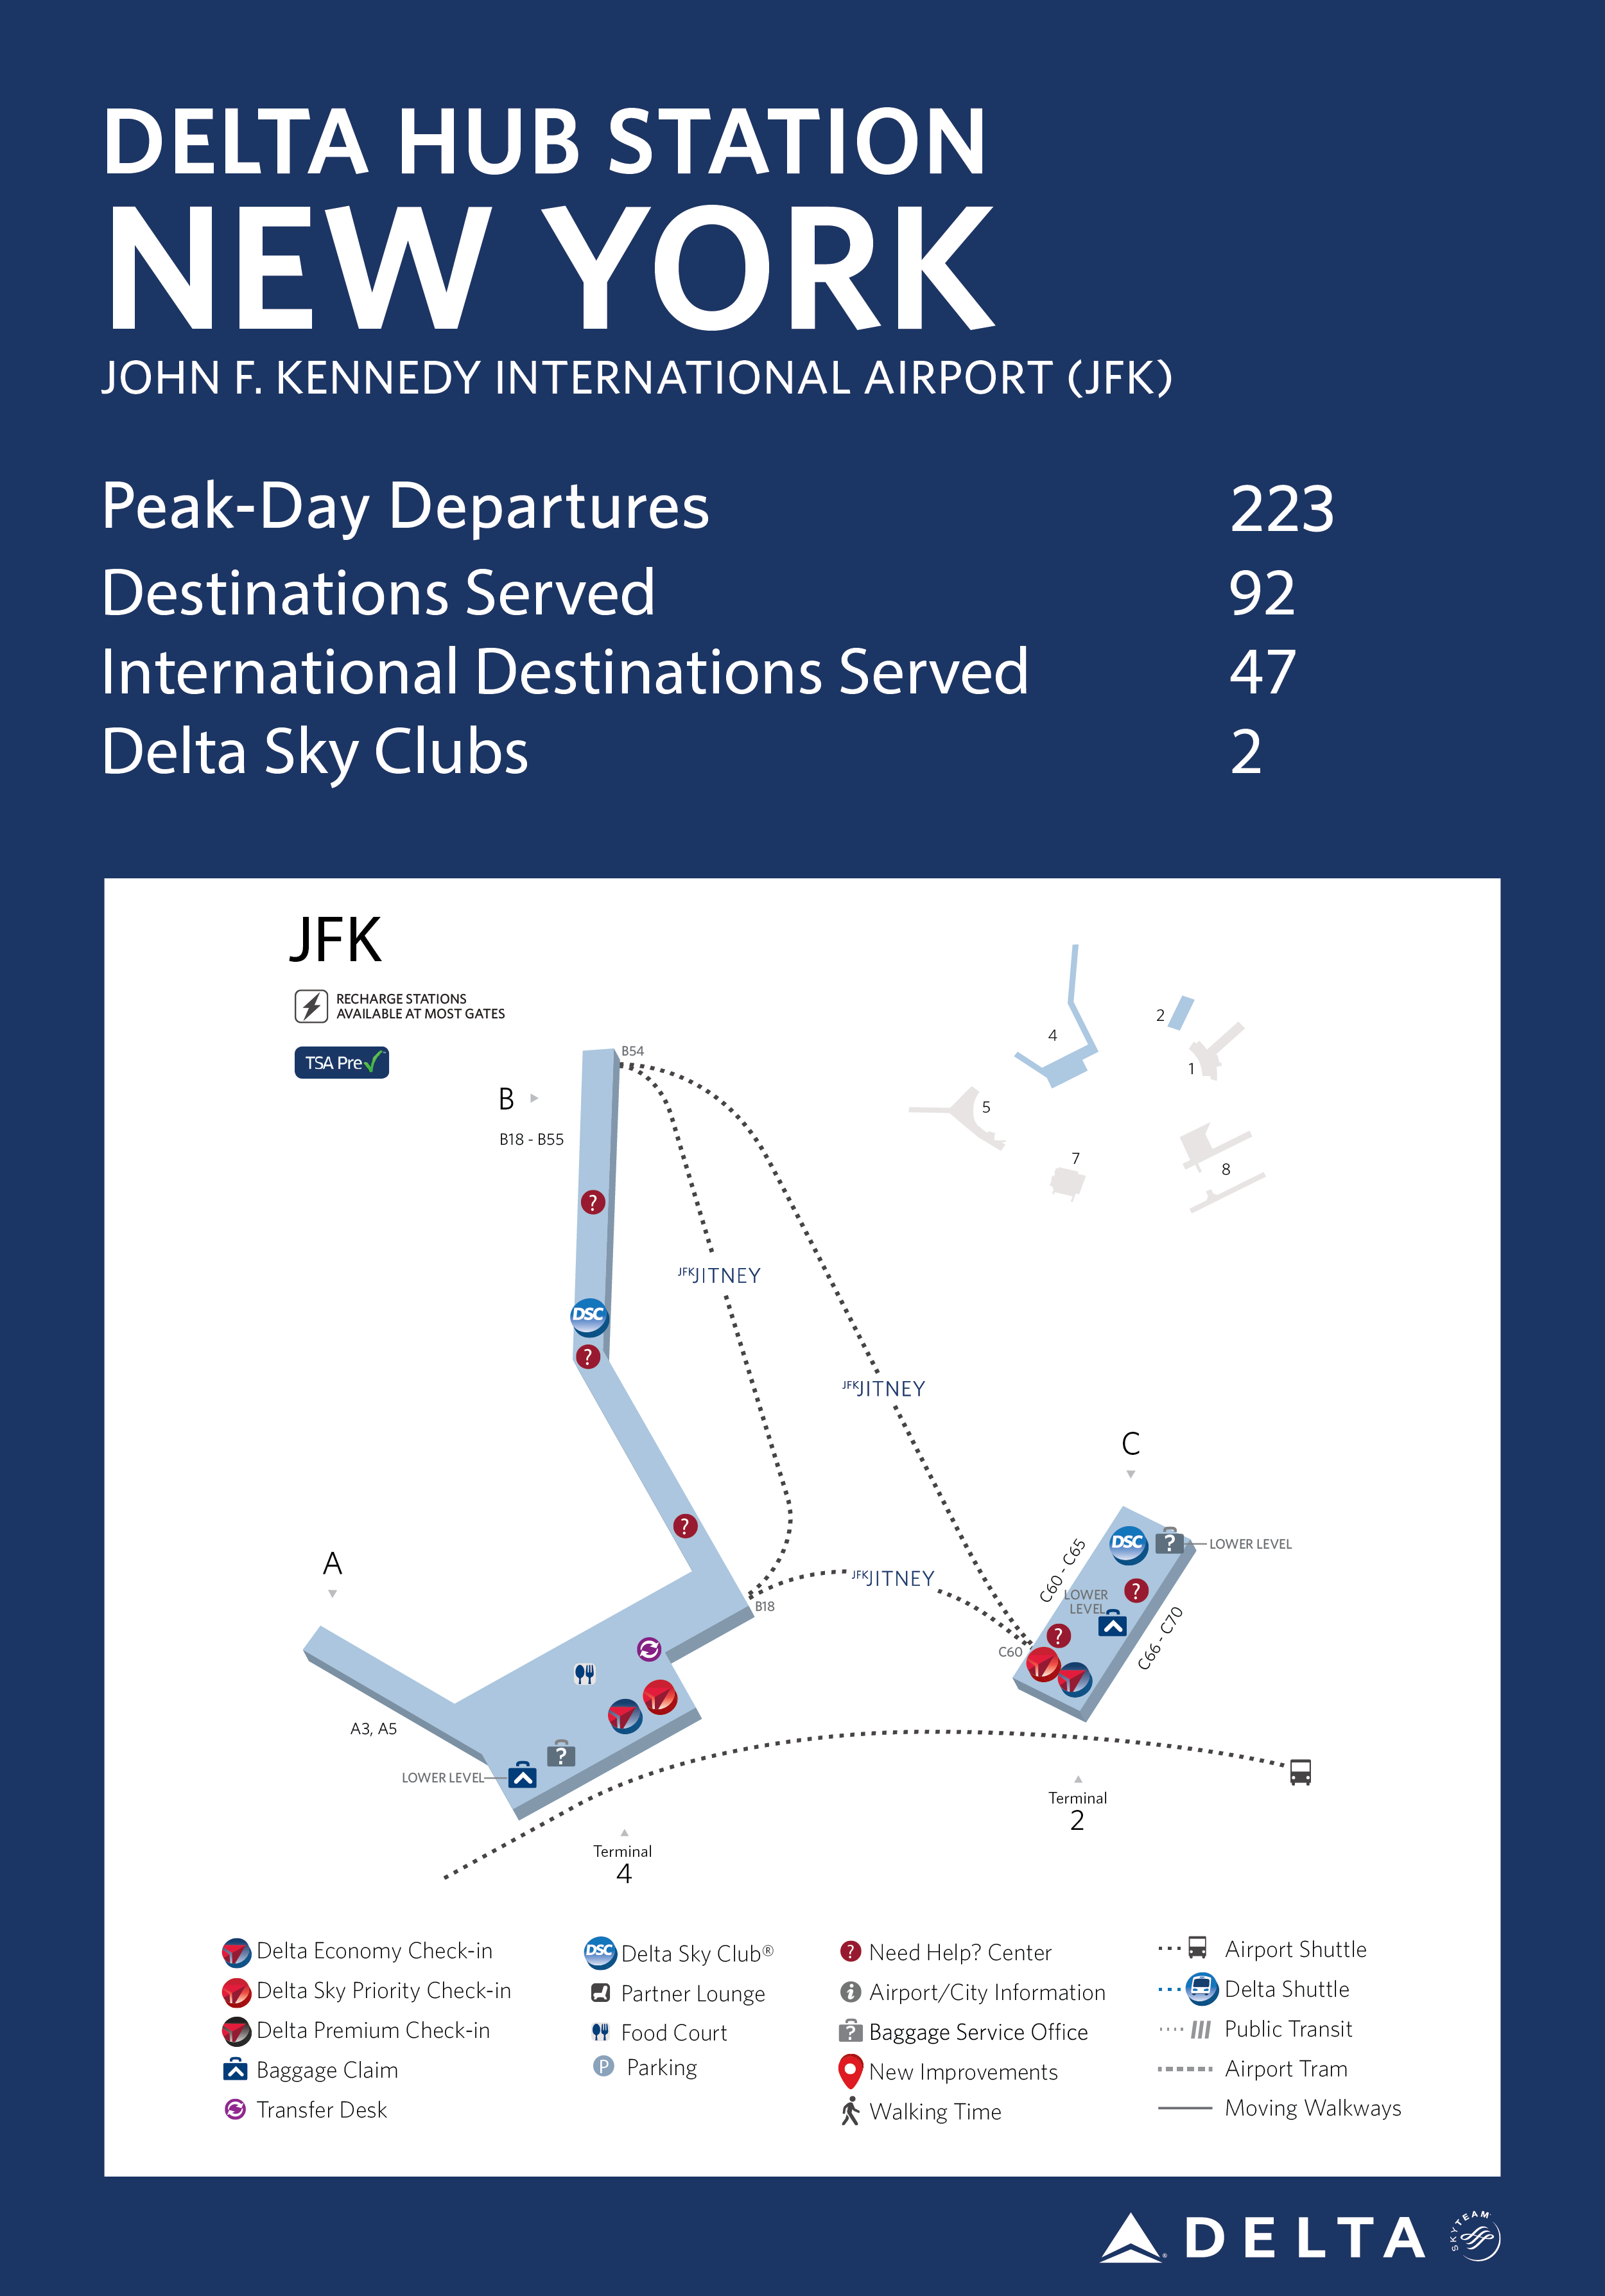 New York (JFK) Hub Station Fact Sheet